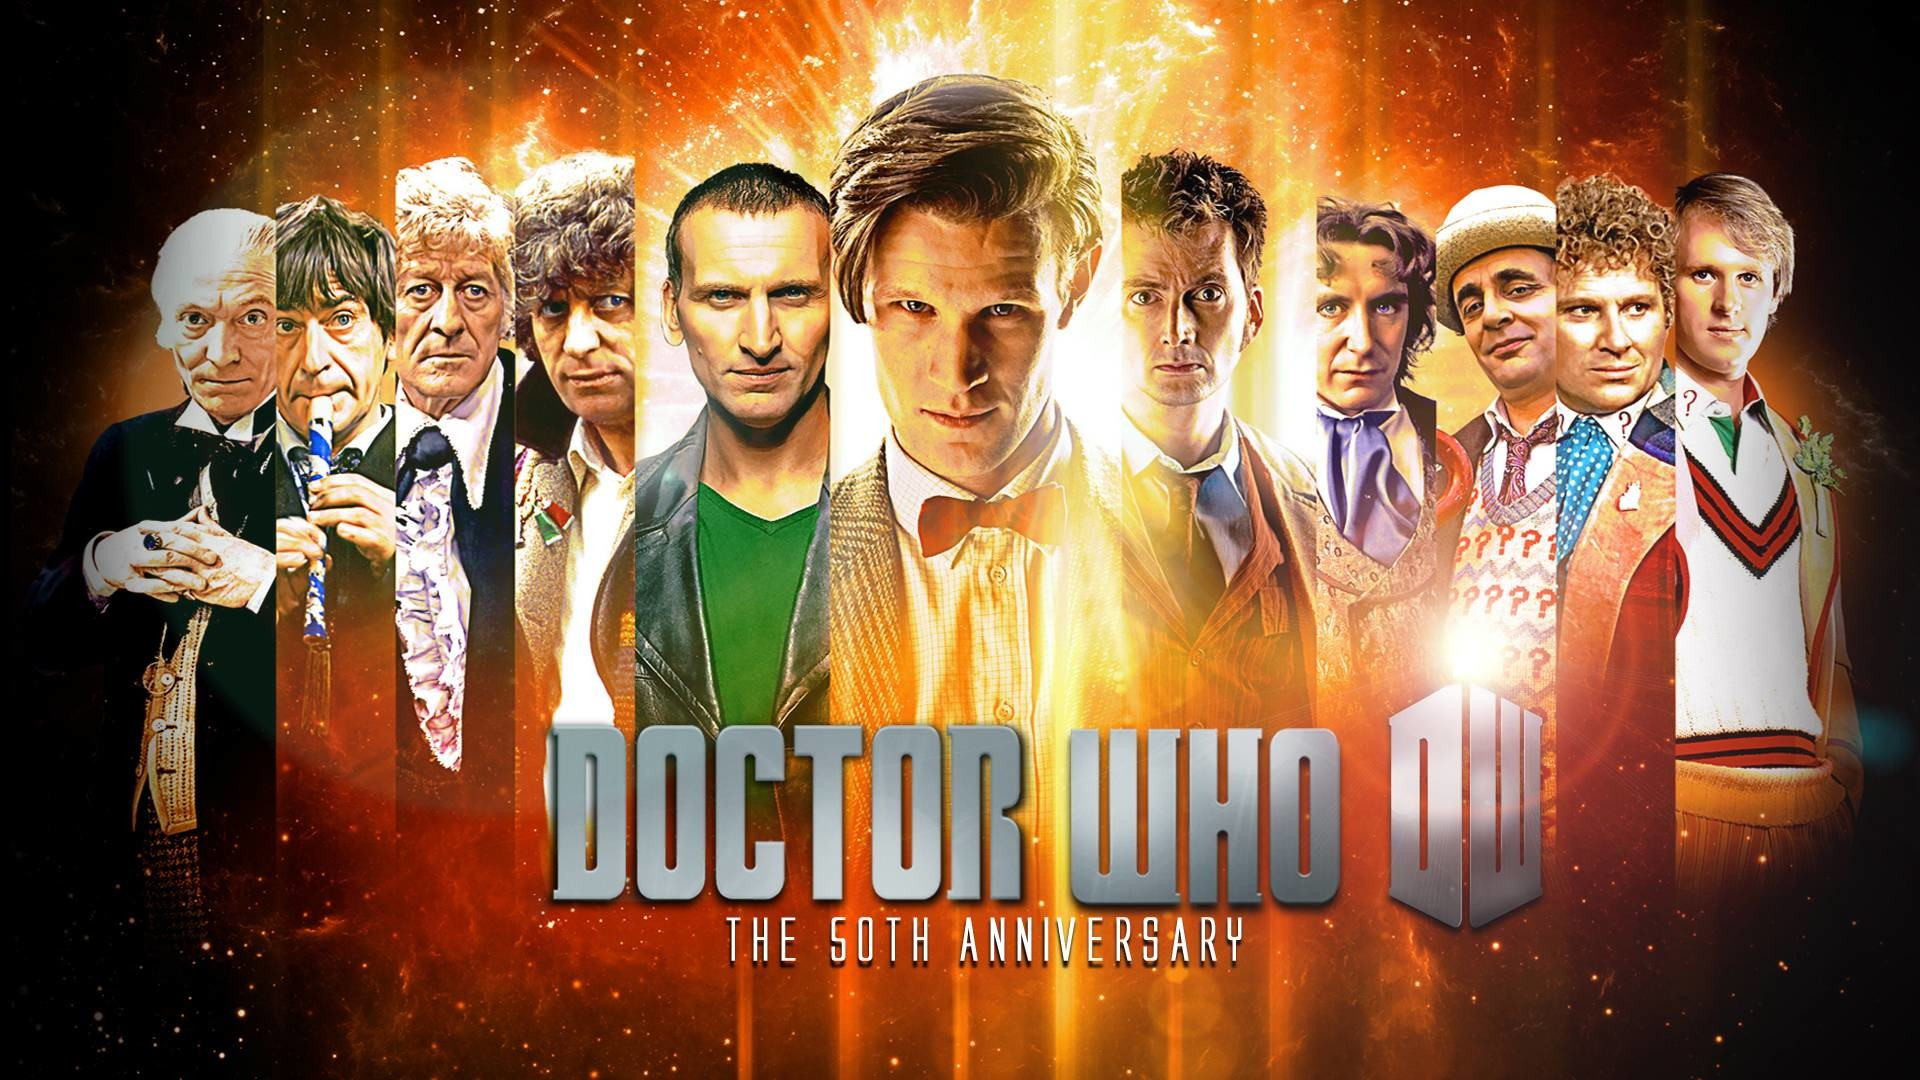 AmazingPict.com | Doctor Who Wallpaper HD